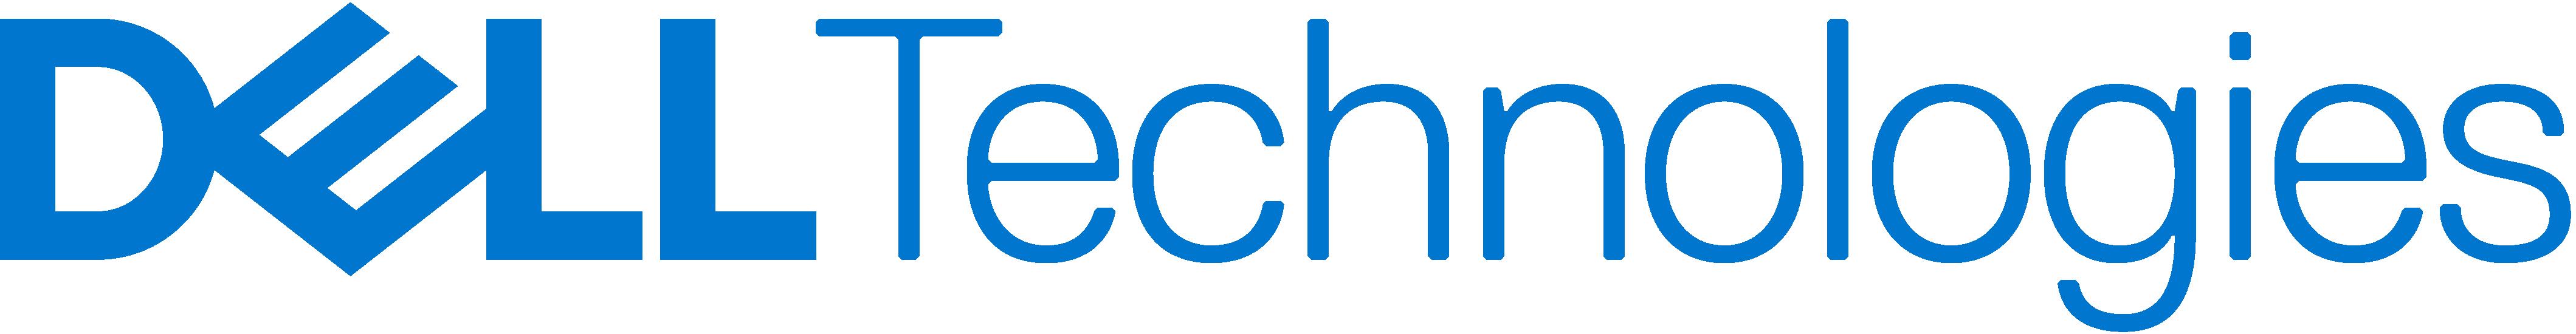 delltech_logo_prm_blue_rgb